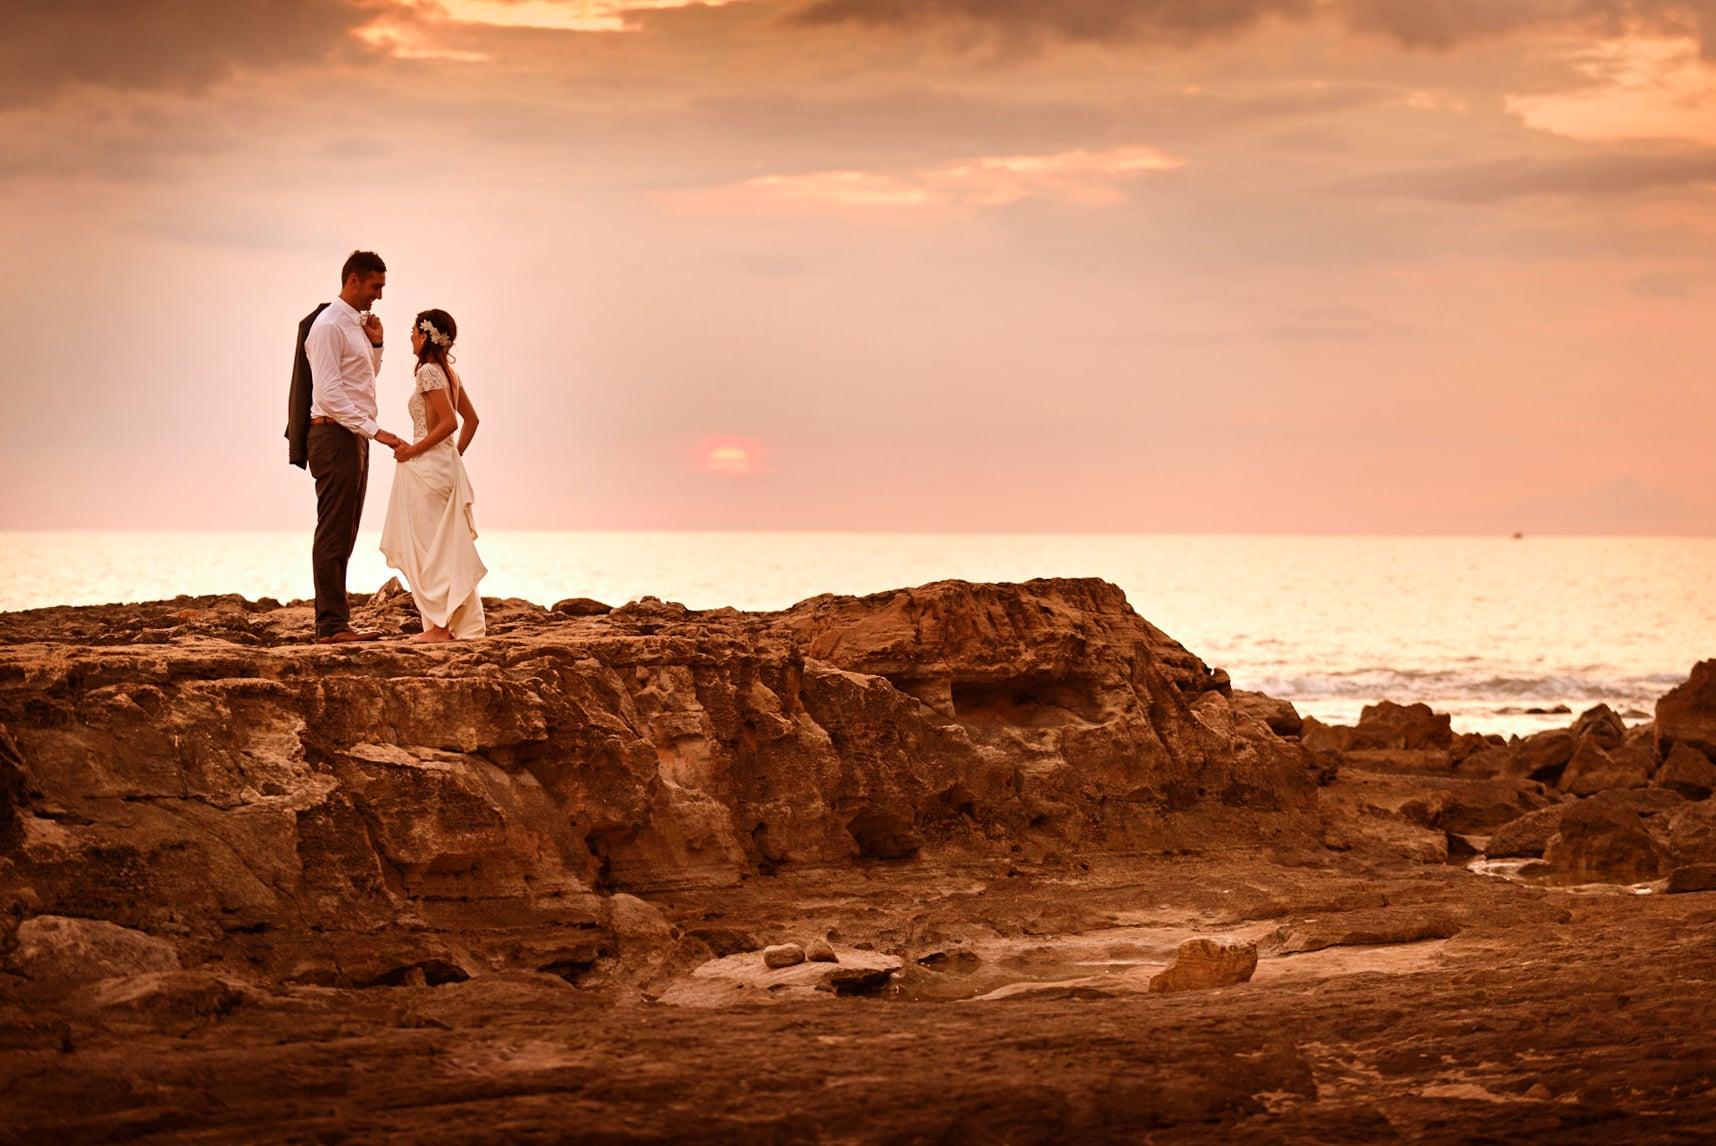 lanikuhonua beach wedding oahu hawaii stephen ludwig025.jpg